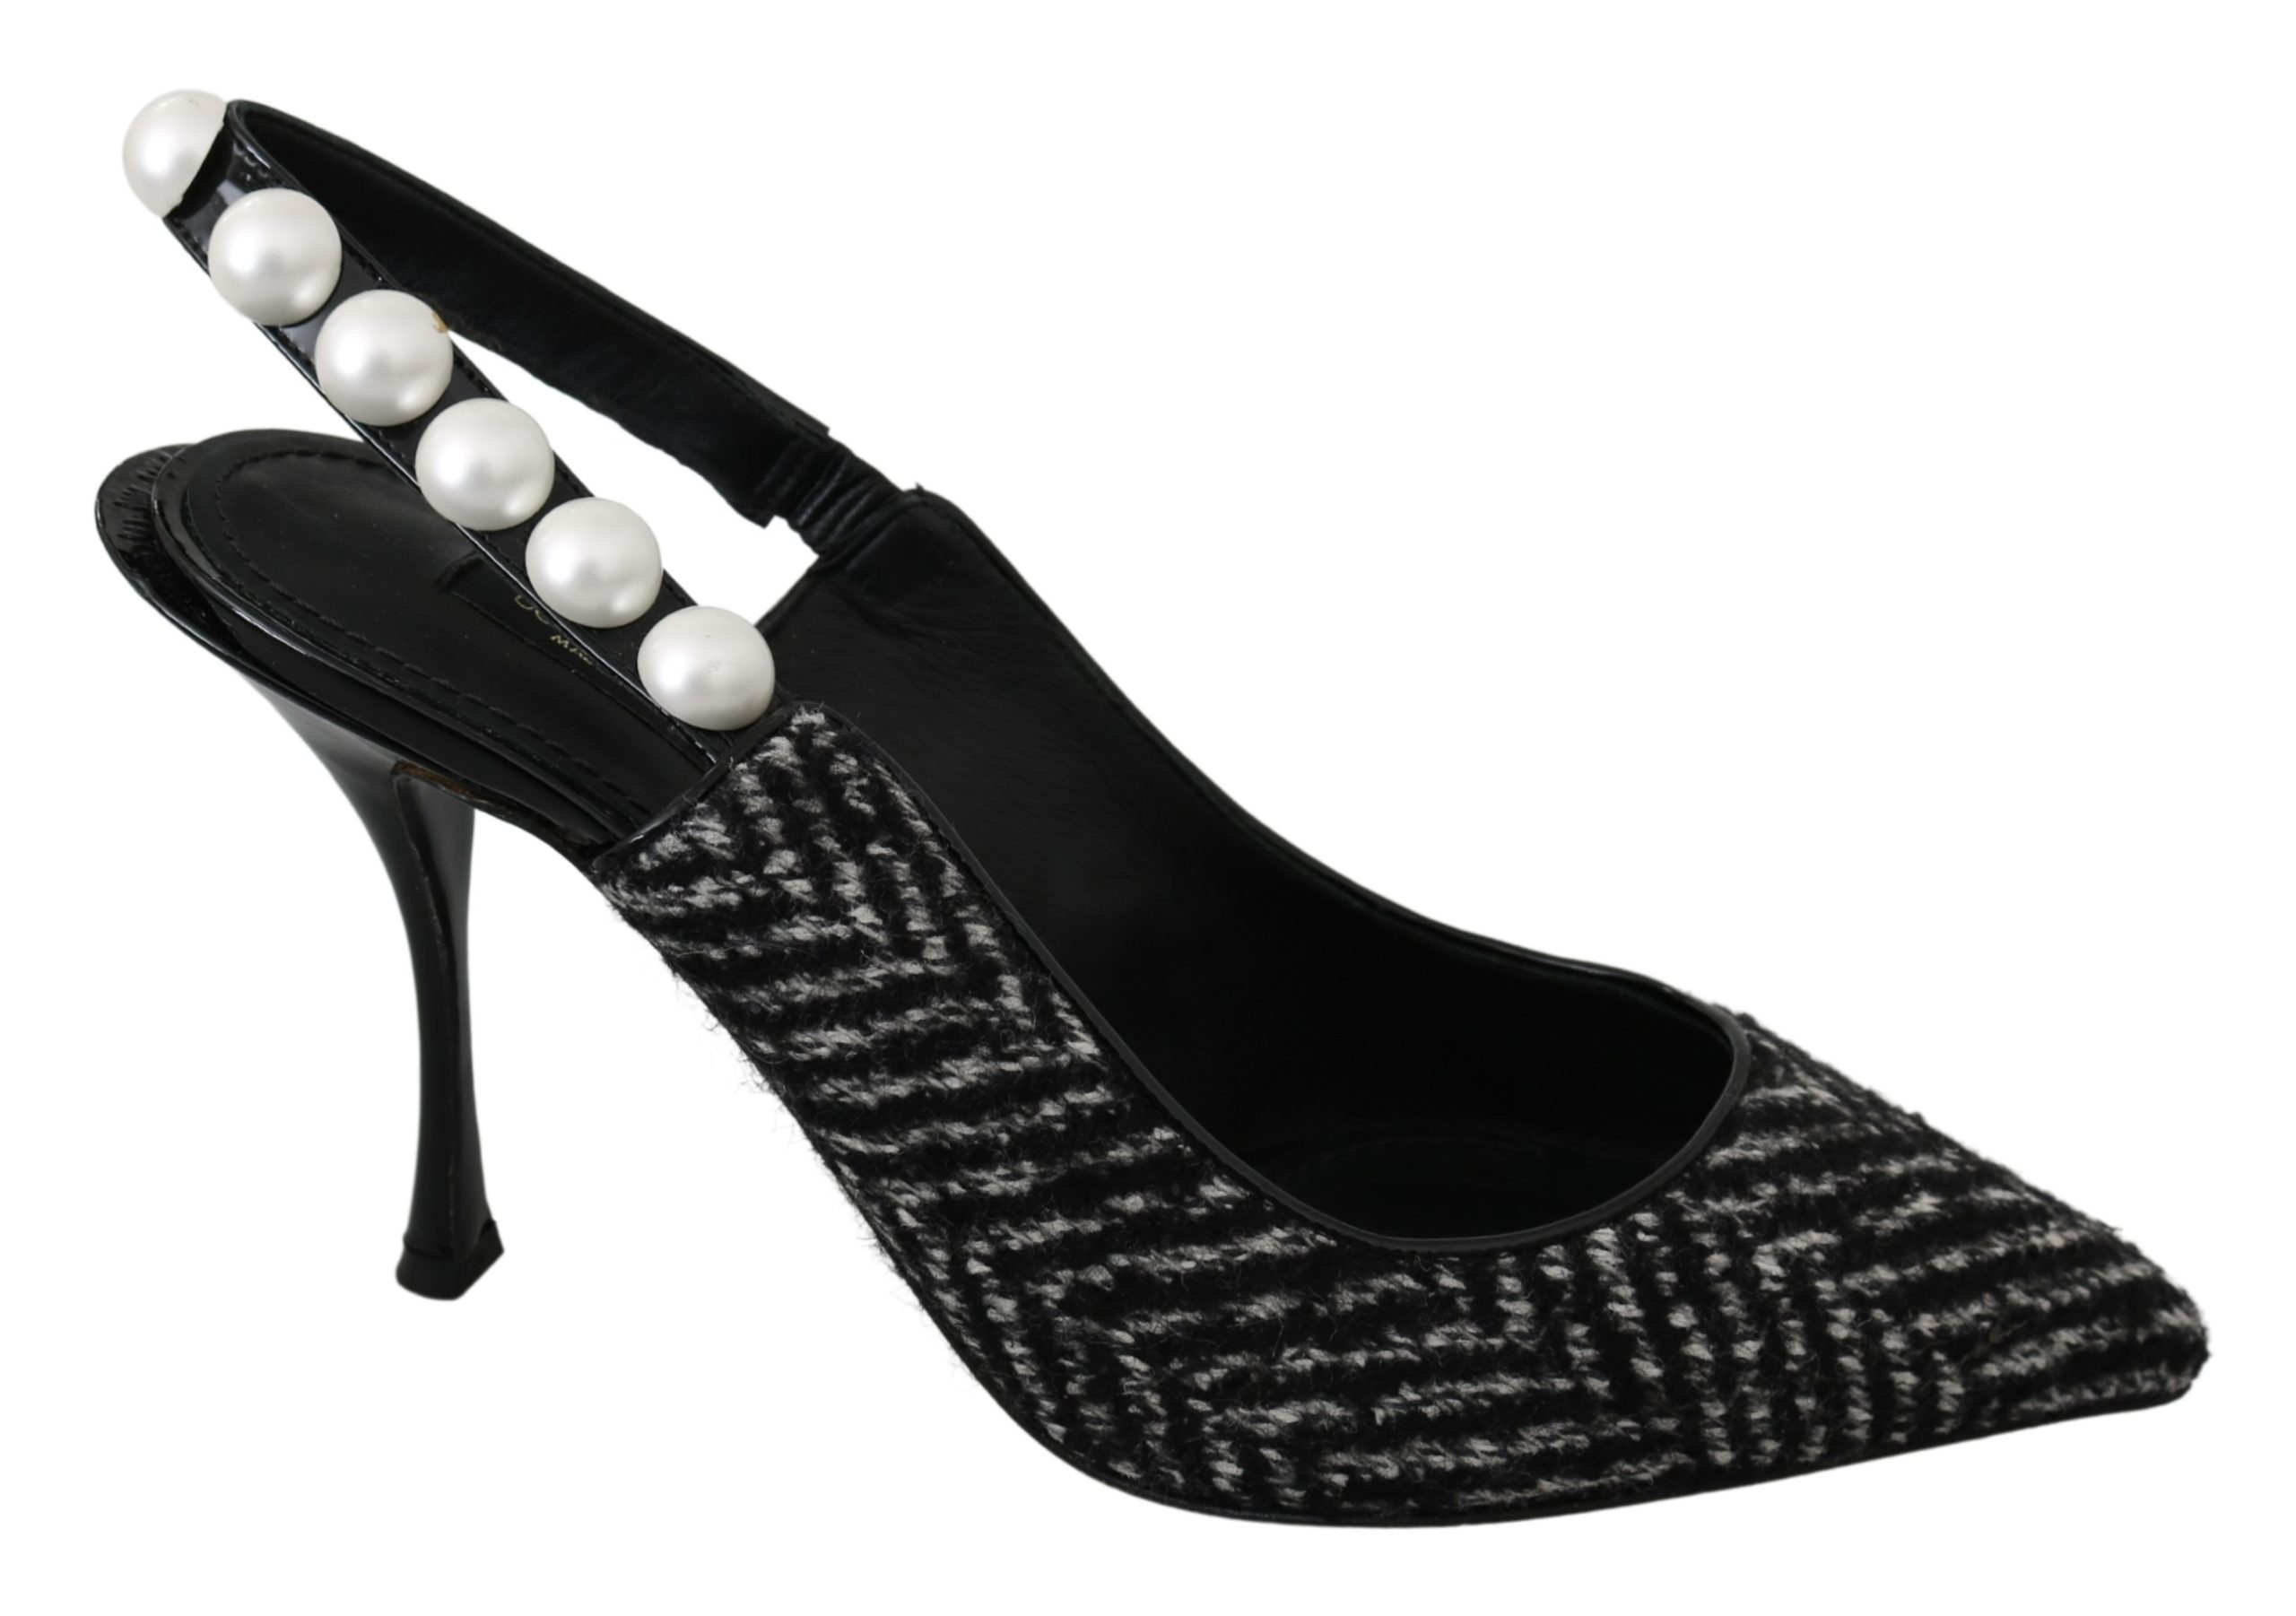 Dolce & Gabbana Women's Chevron Pearls Slingback Heels Black LA6967 - EU39/US8.5